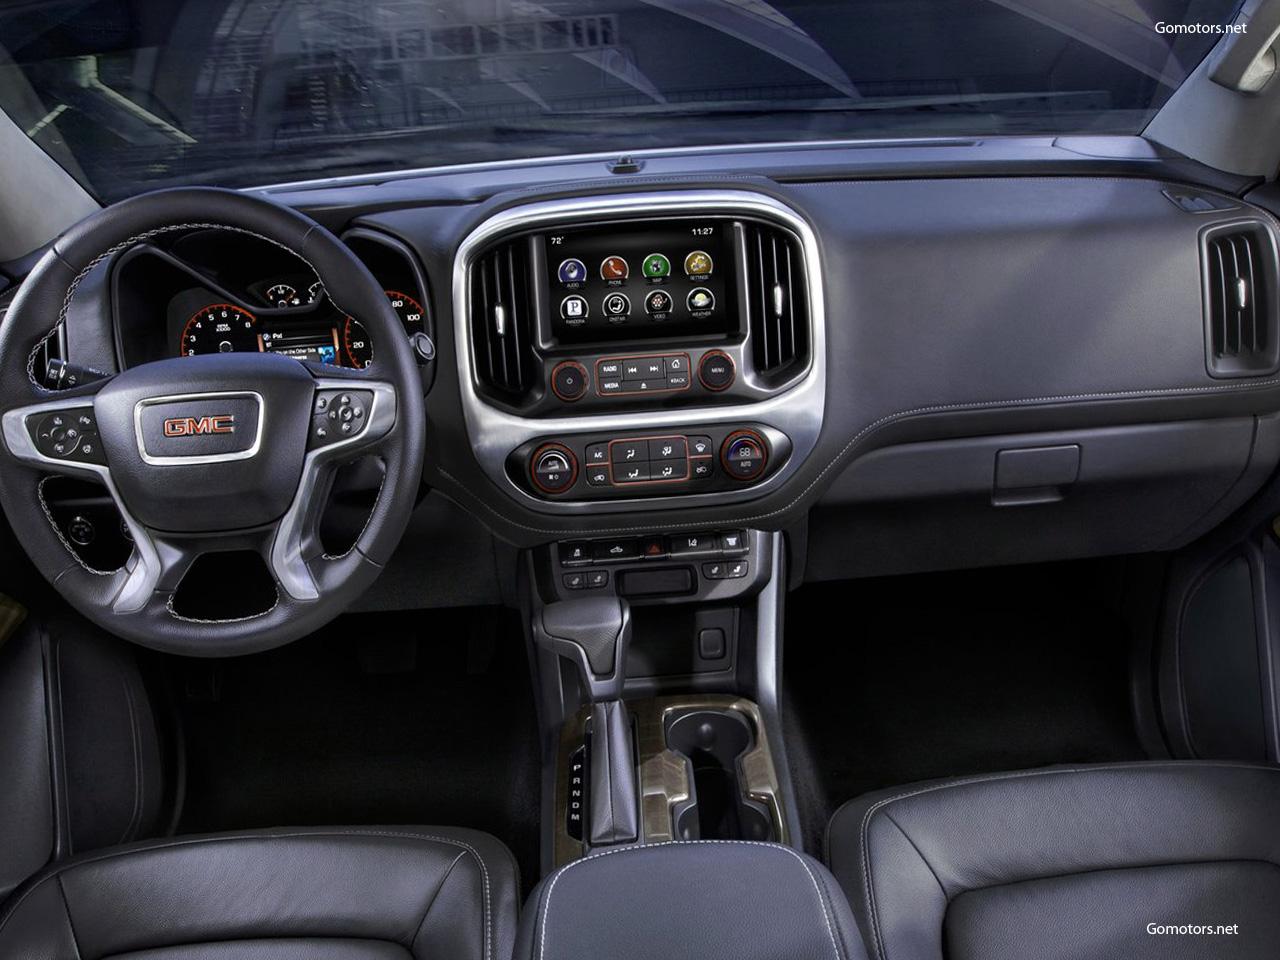 GMC Canyon 2015 - Photos, News, Reviews, Specs, Car listings